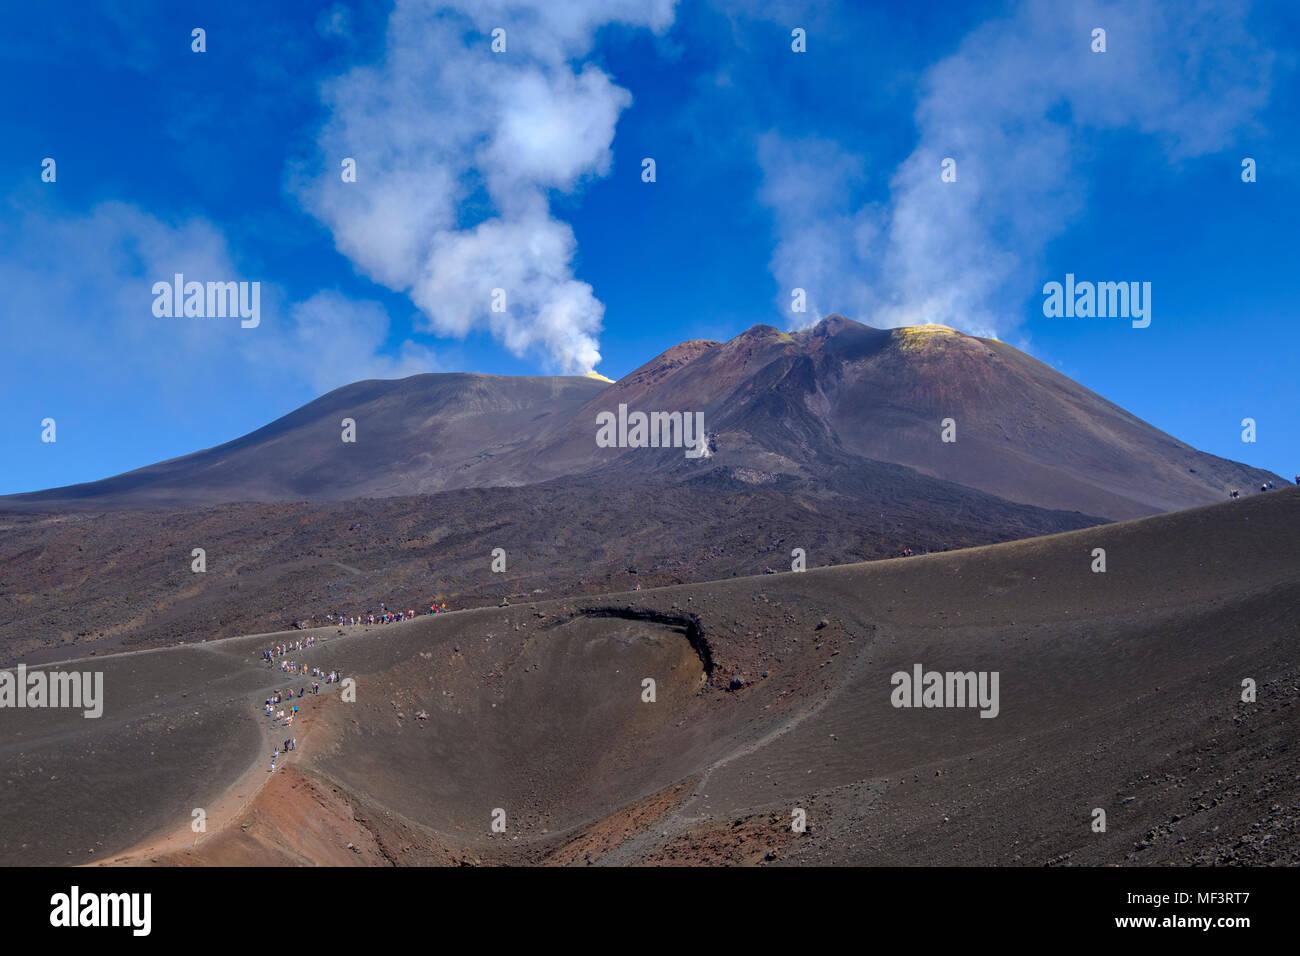 am Torre del Filosofo, rauchender Gipfel, Krater, Vulkan Ätna, Provinz Catania, Silzilien, Italien, - Stock Image